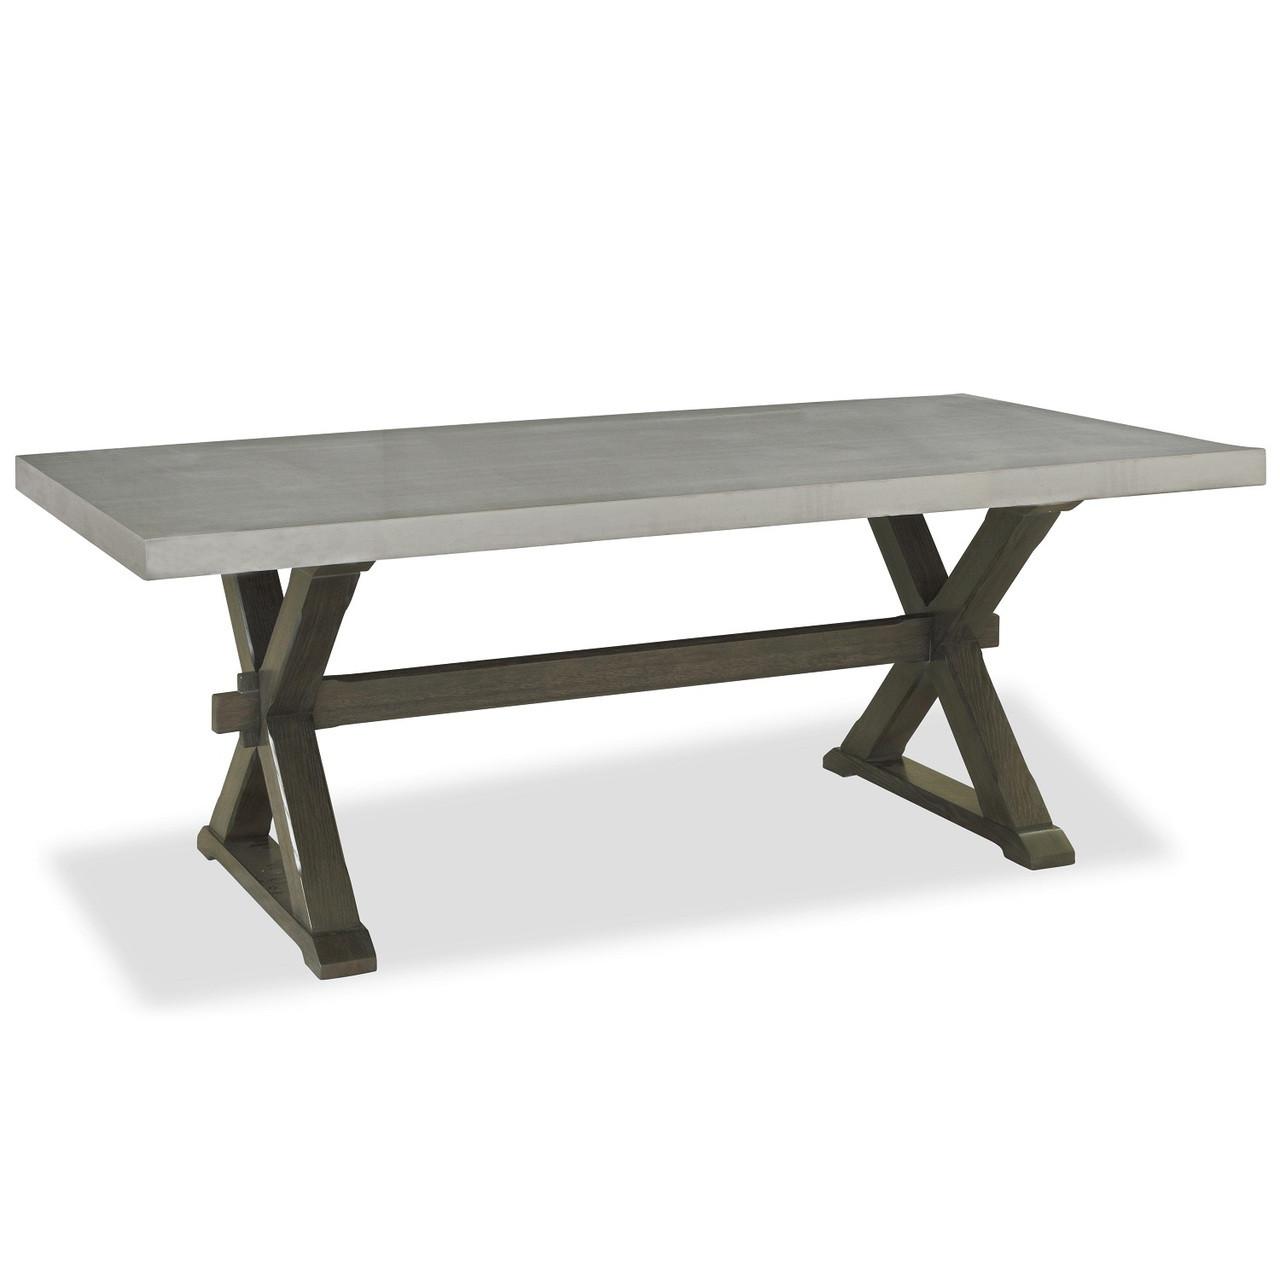 Flatiron Oak Wood + Stainless Steel X-Base Dining Table